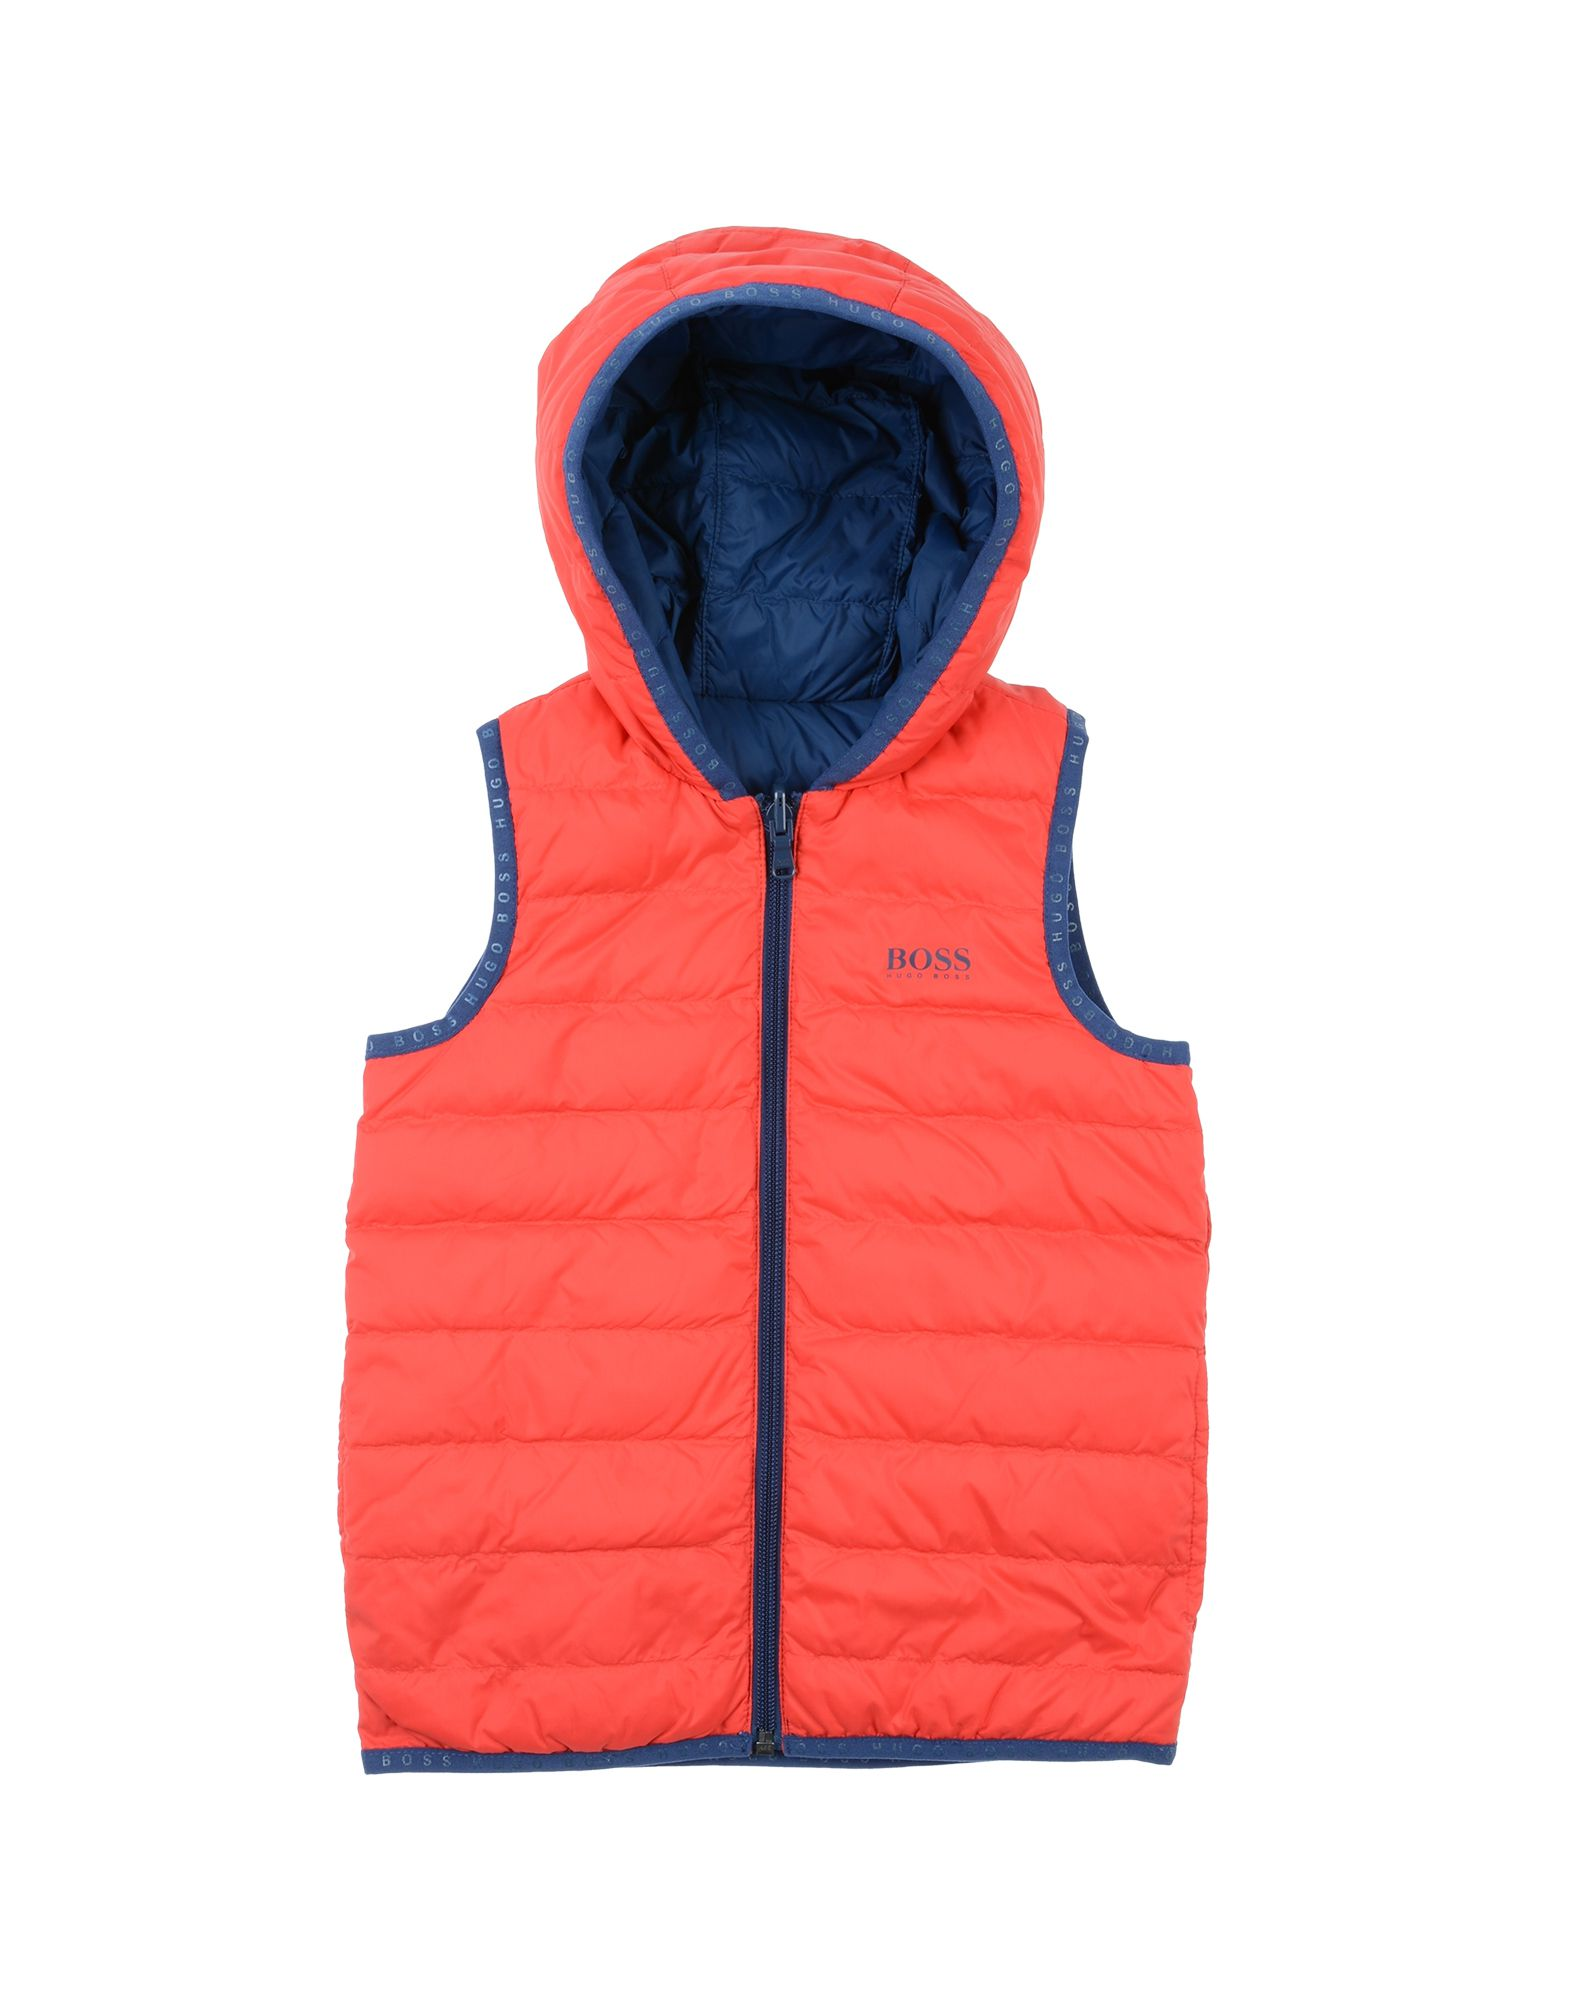 BOSS Down jackets